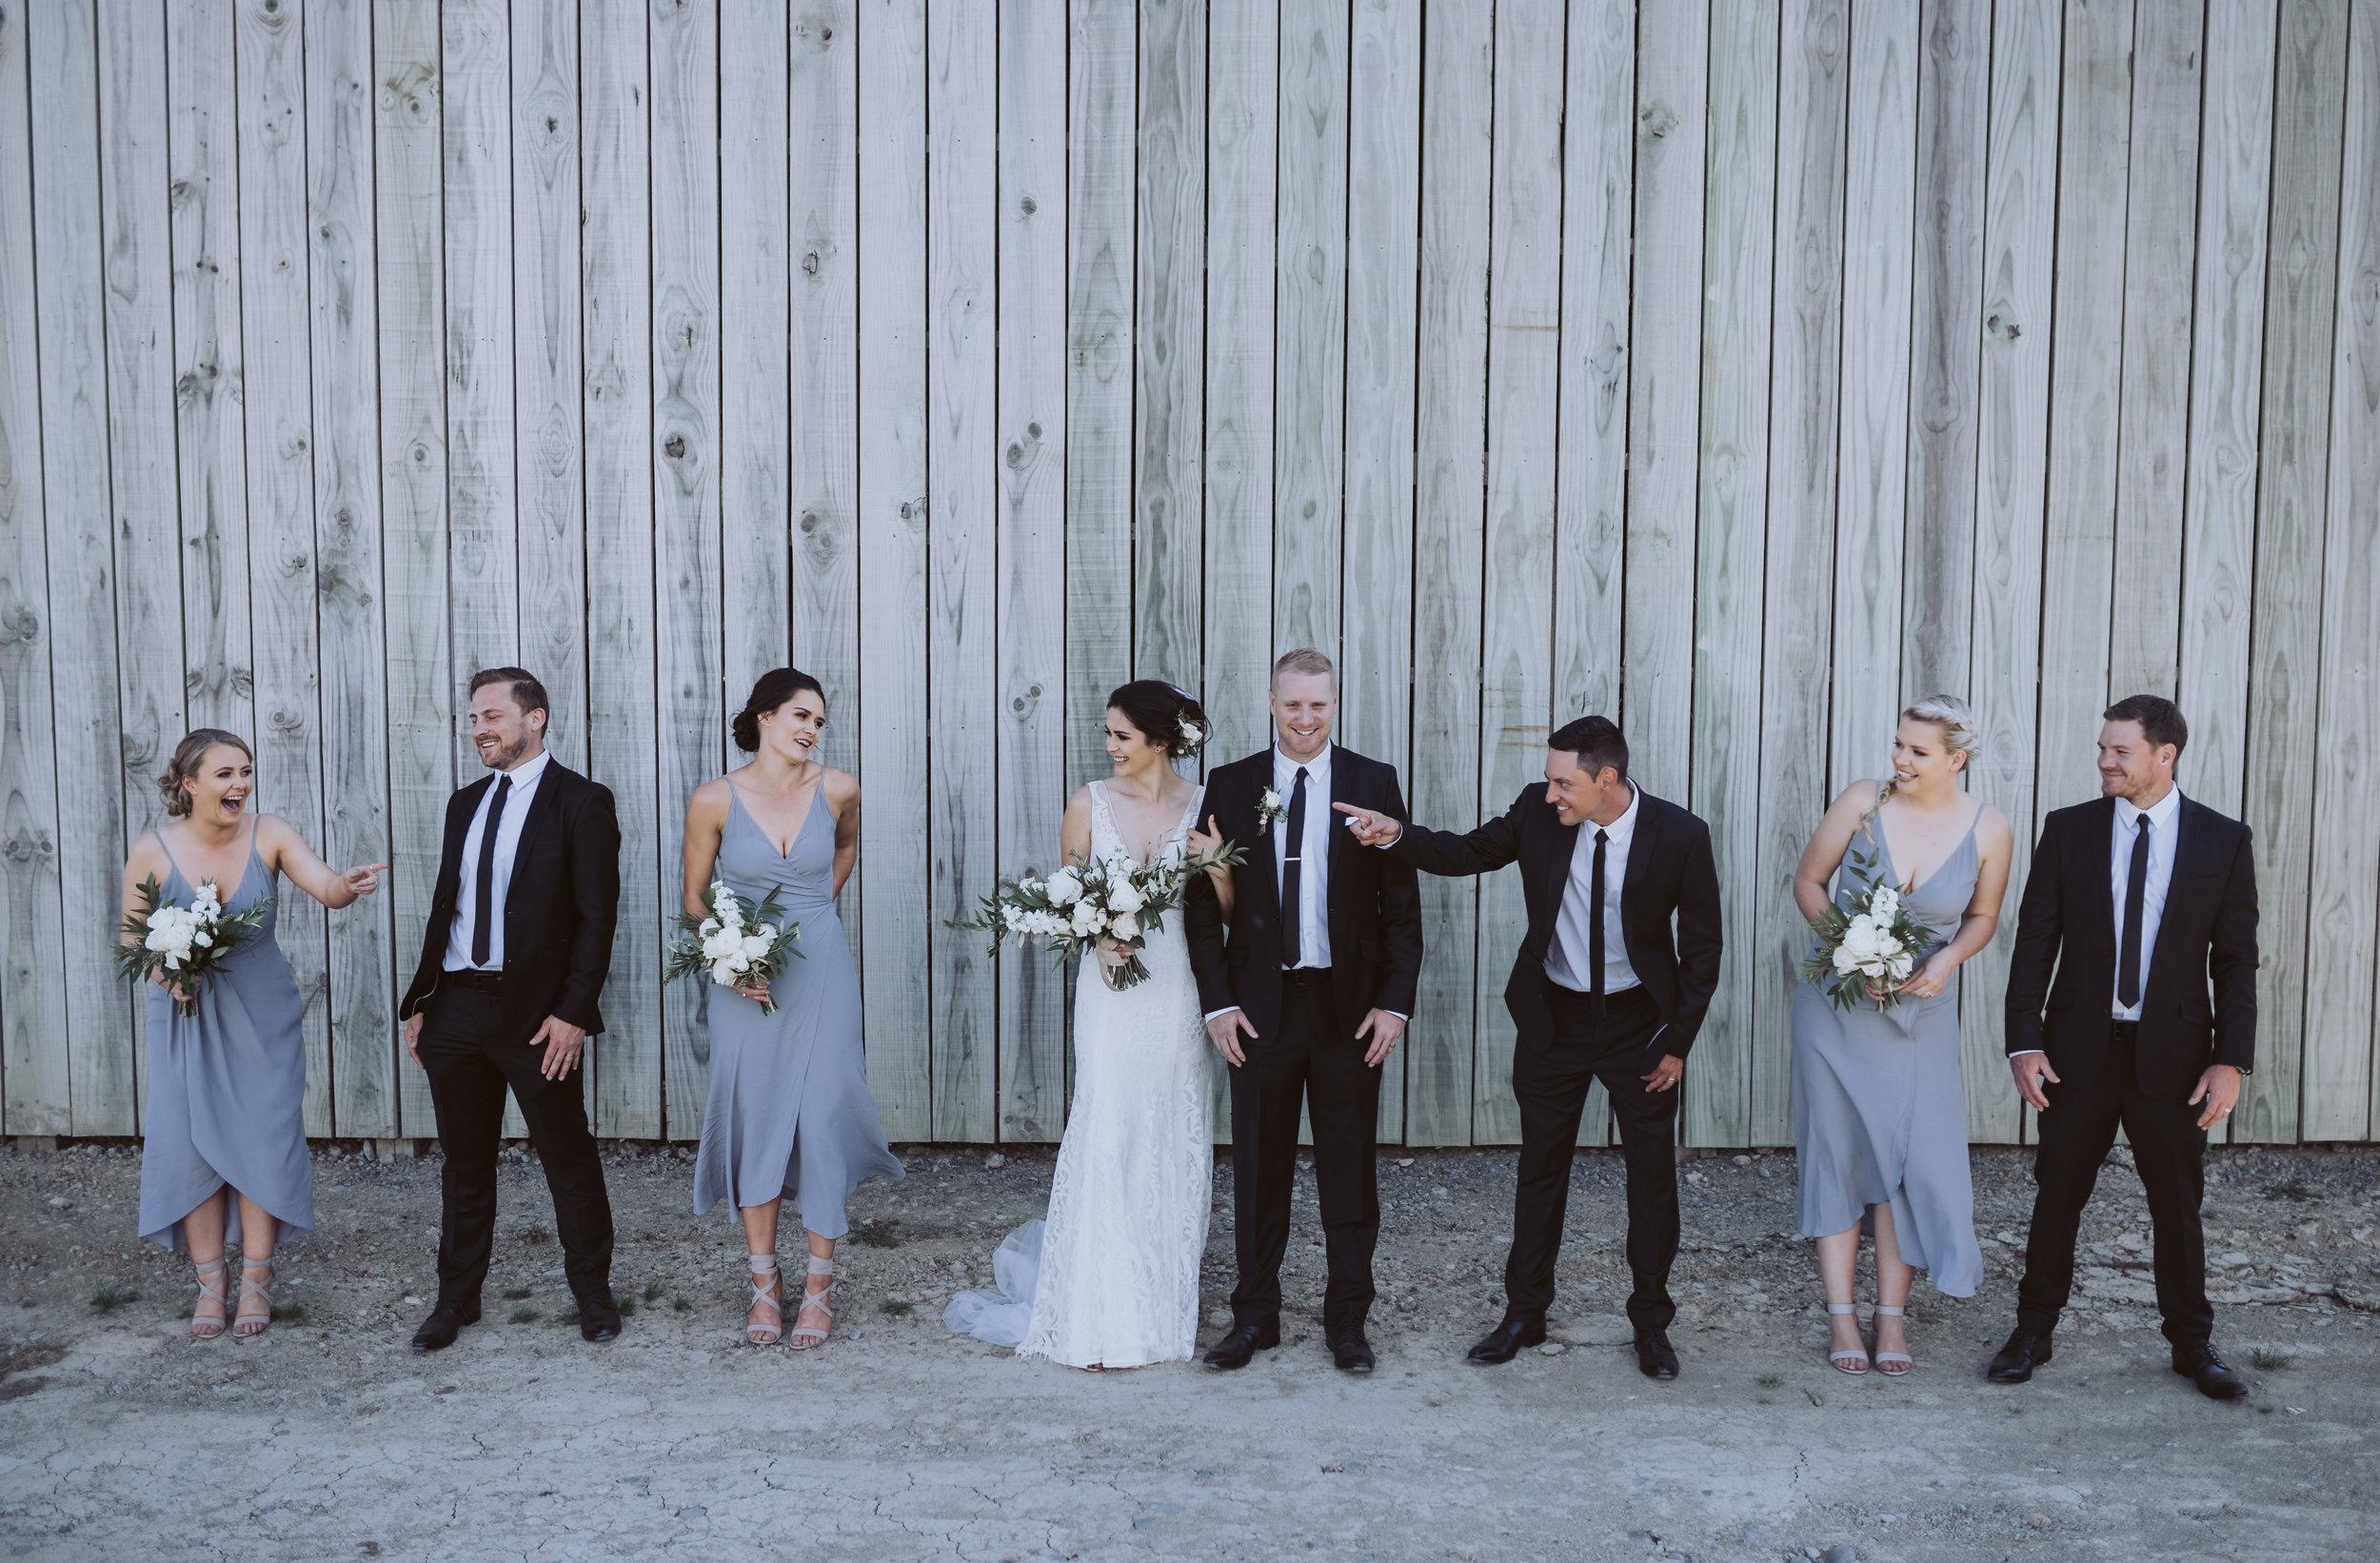 Chimere + Tim Wedding